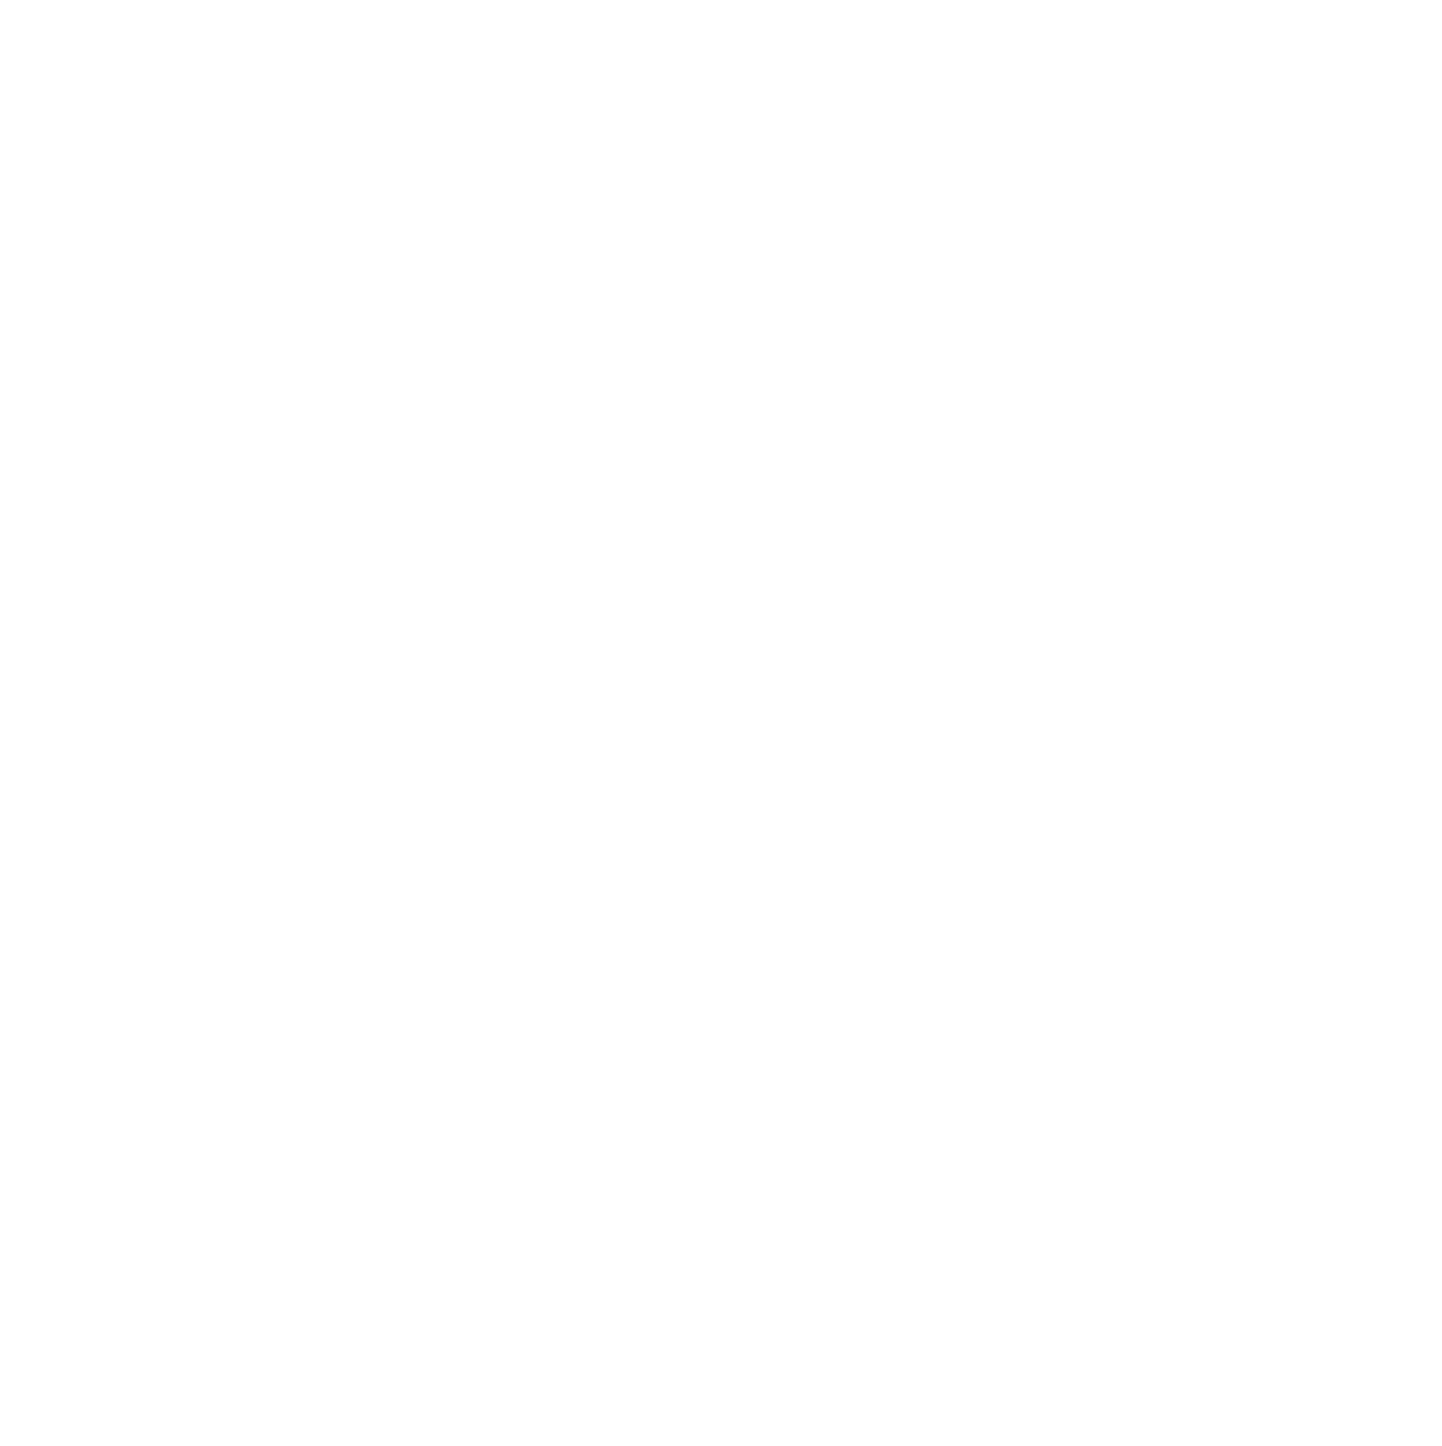 carte-pass-asbh-beziers-maison-jardin-batiments